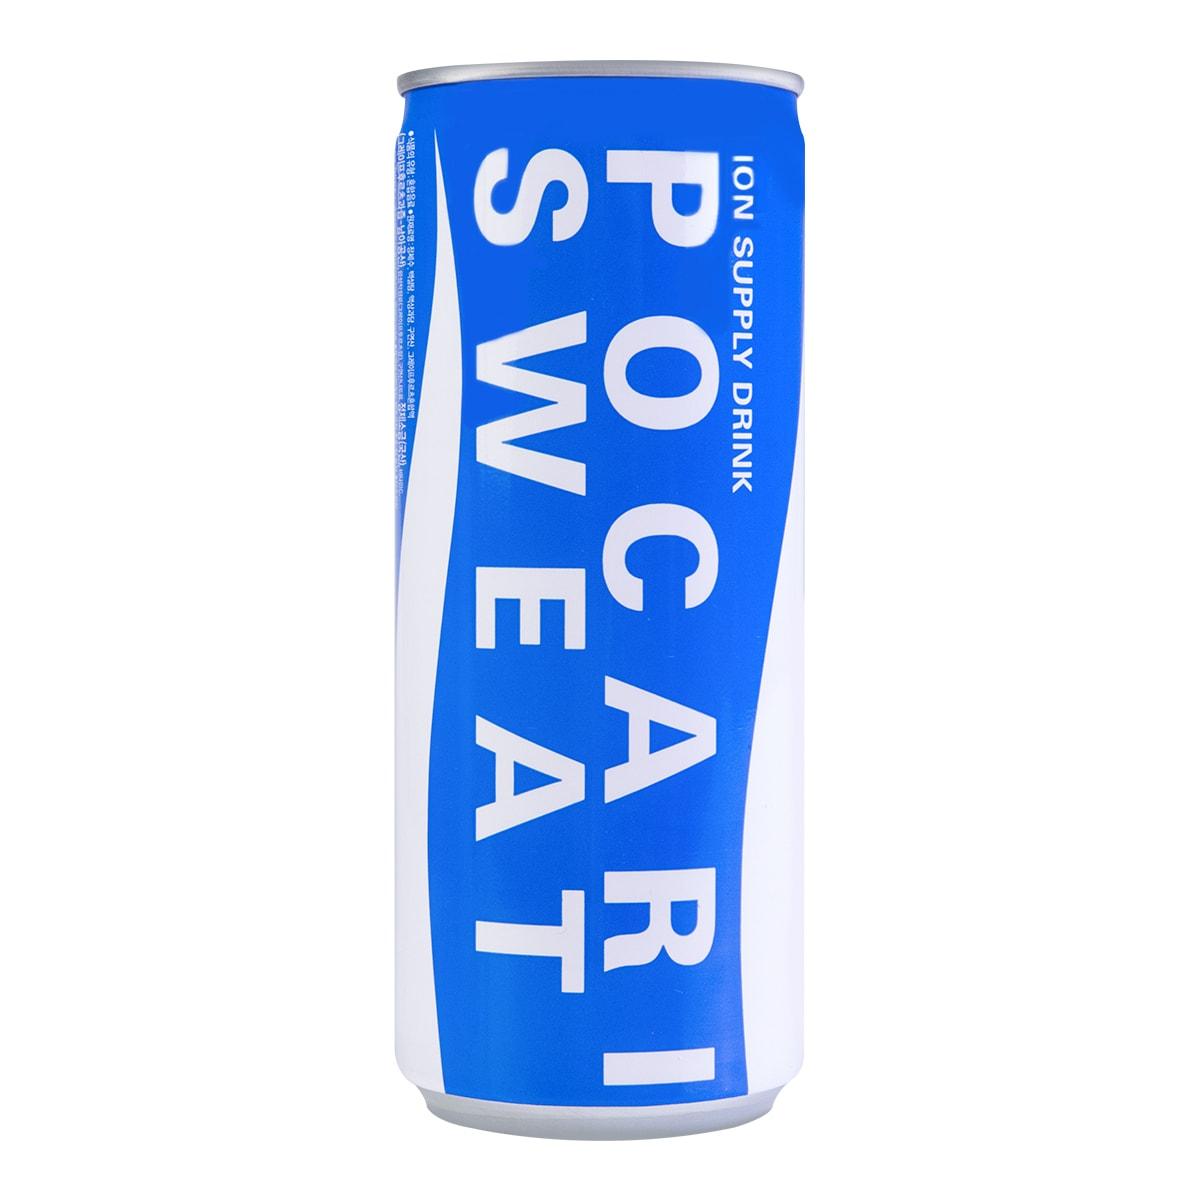 韩国POCARI SWEAT 运动饮料 245ml